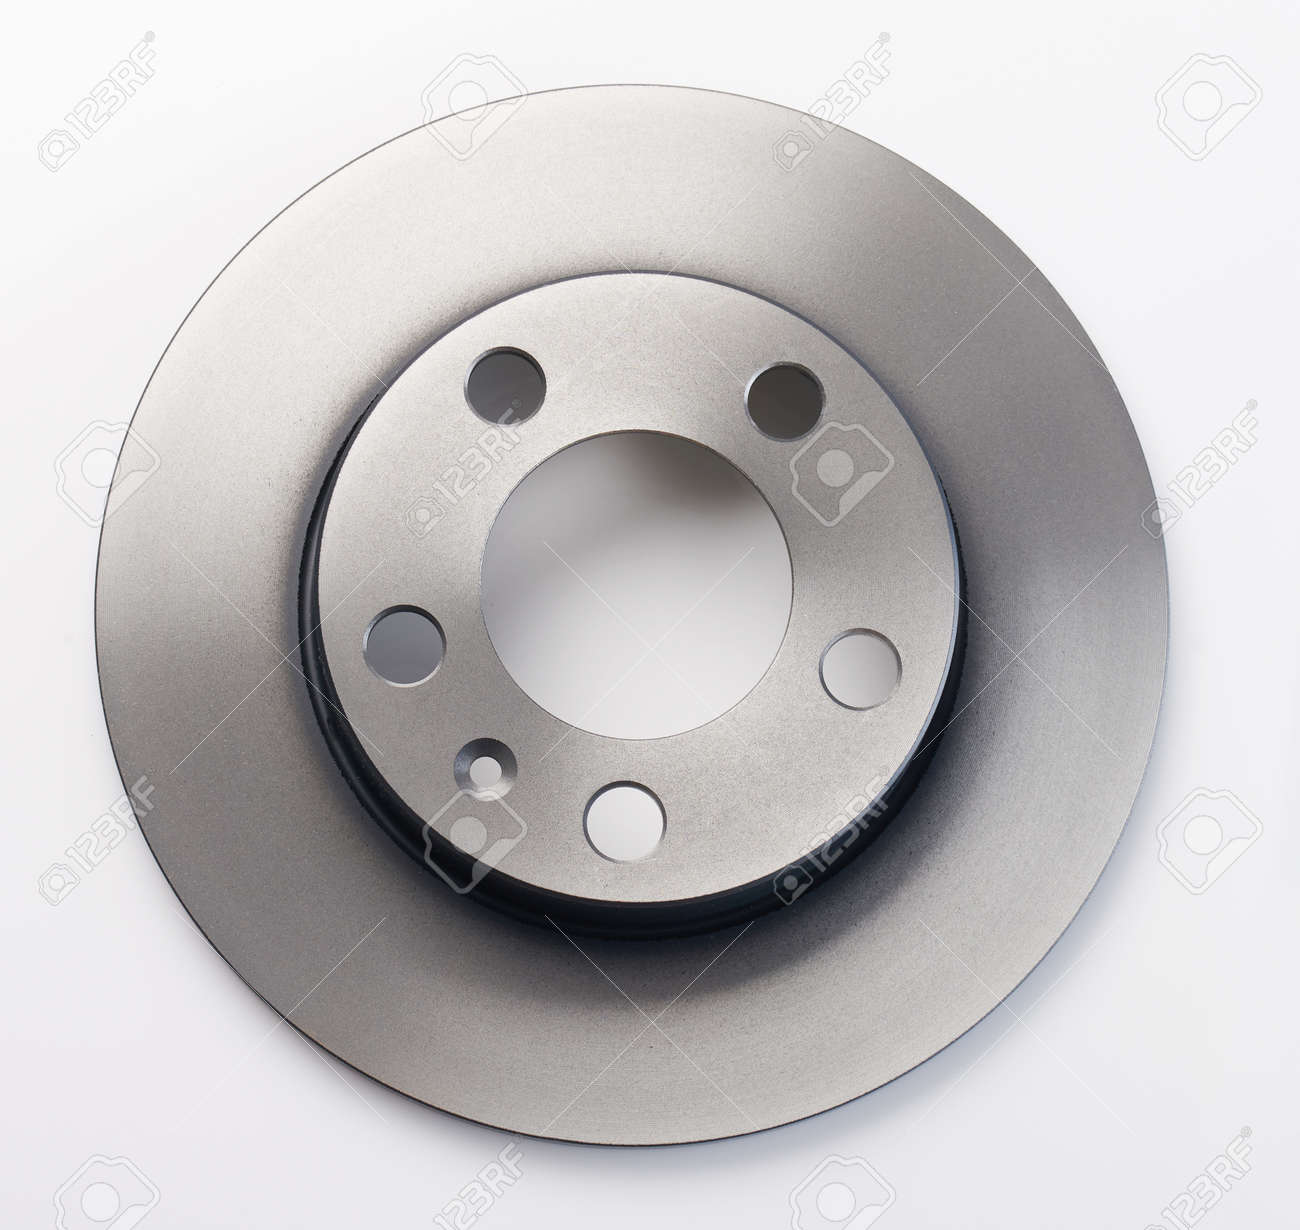 Shiny metal break car disc isolated on studio background - 171368911